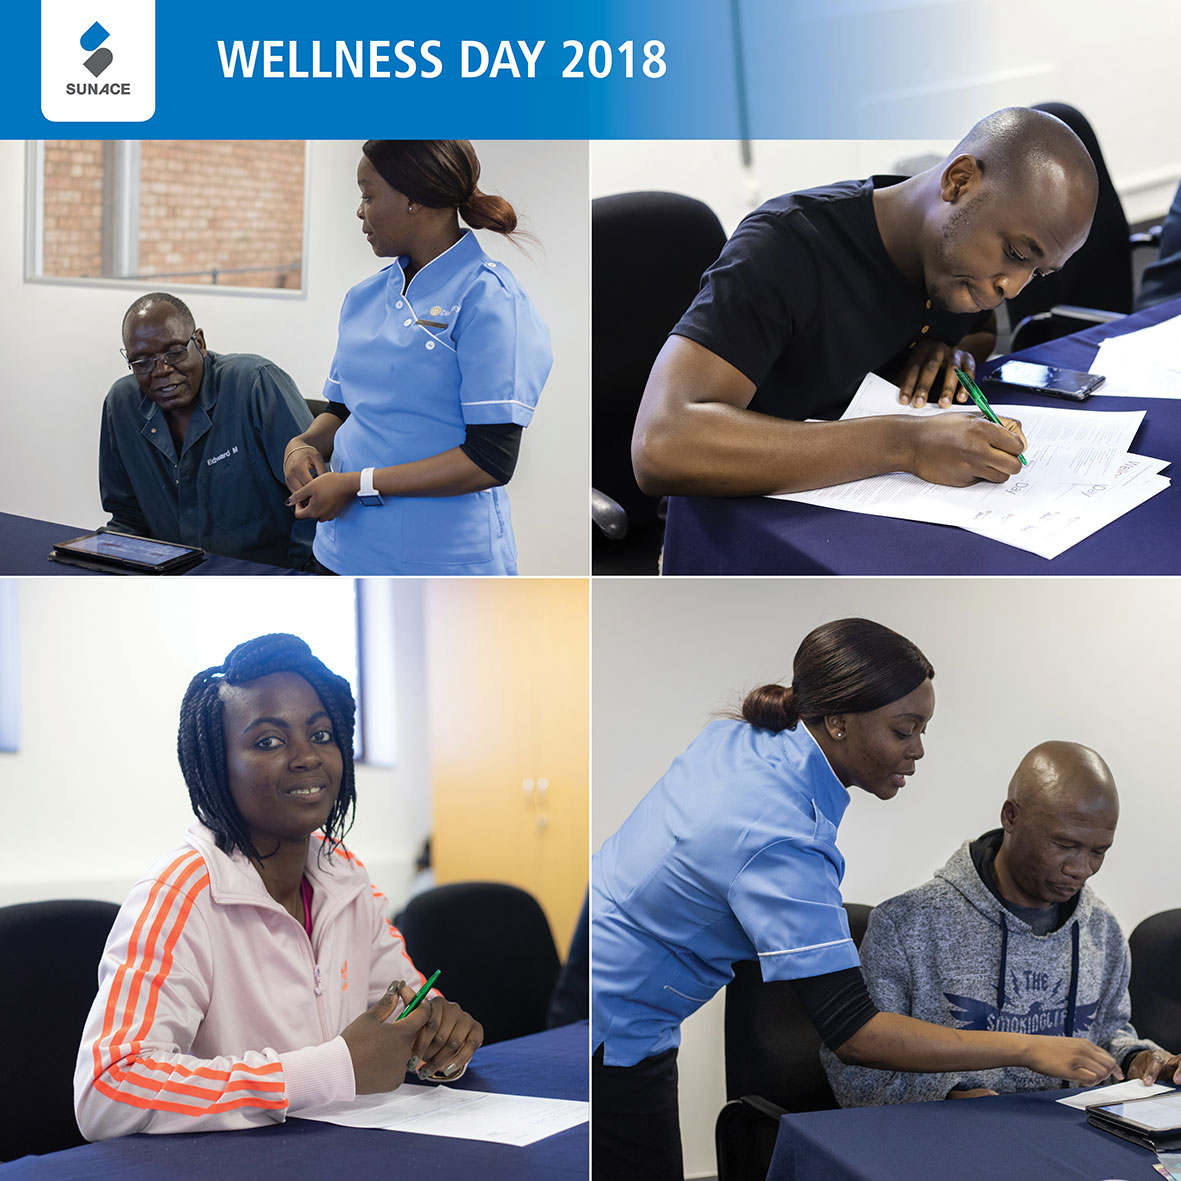 Wellness Day 2018